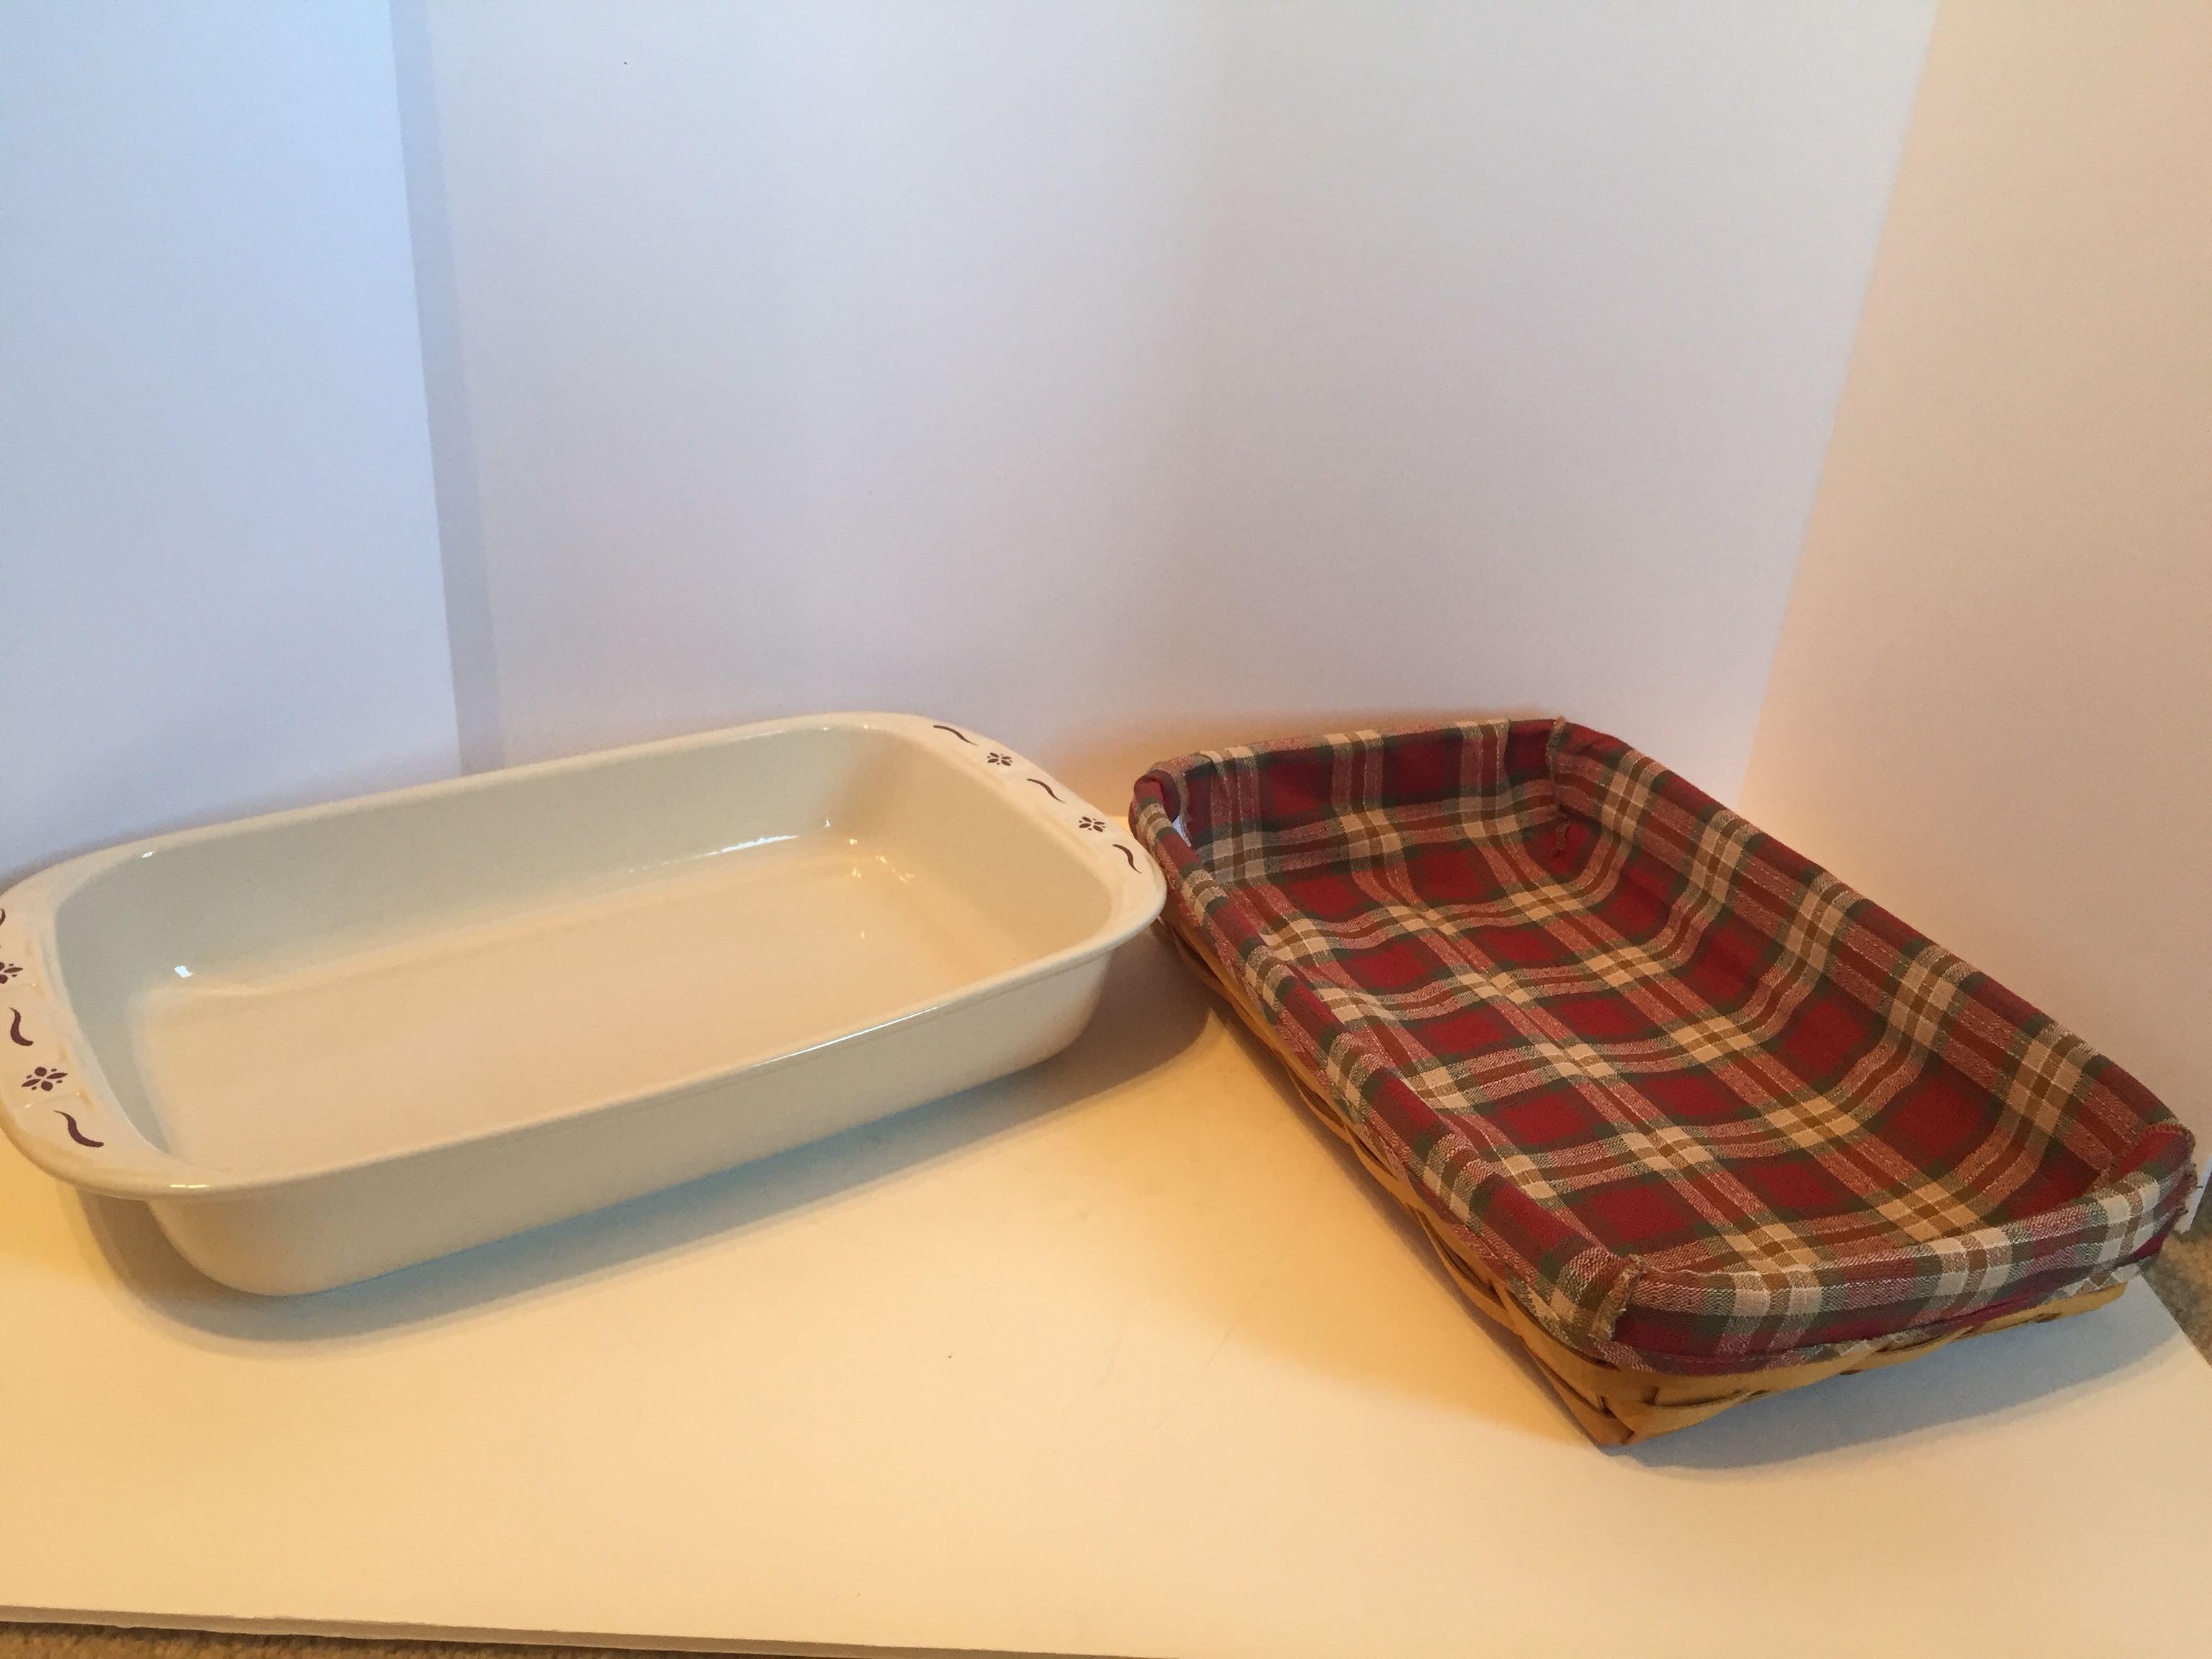 Longaberger - 9x13 Baking Dish #34771 - NEW